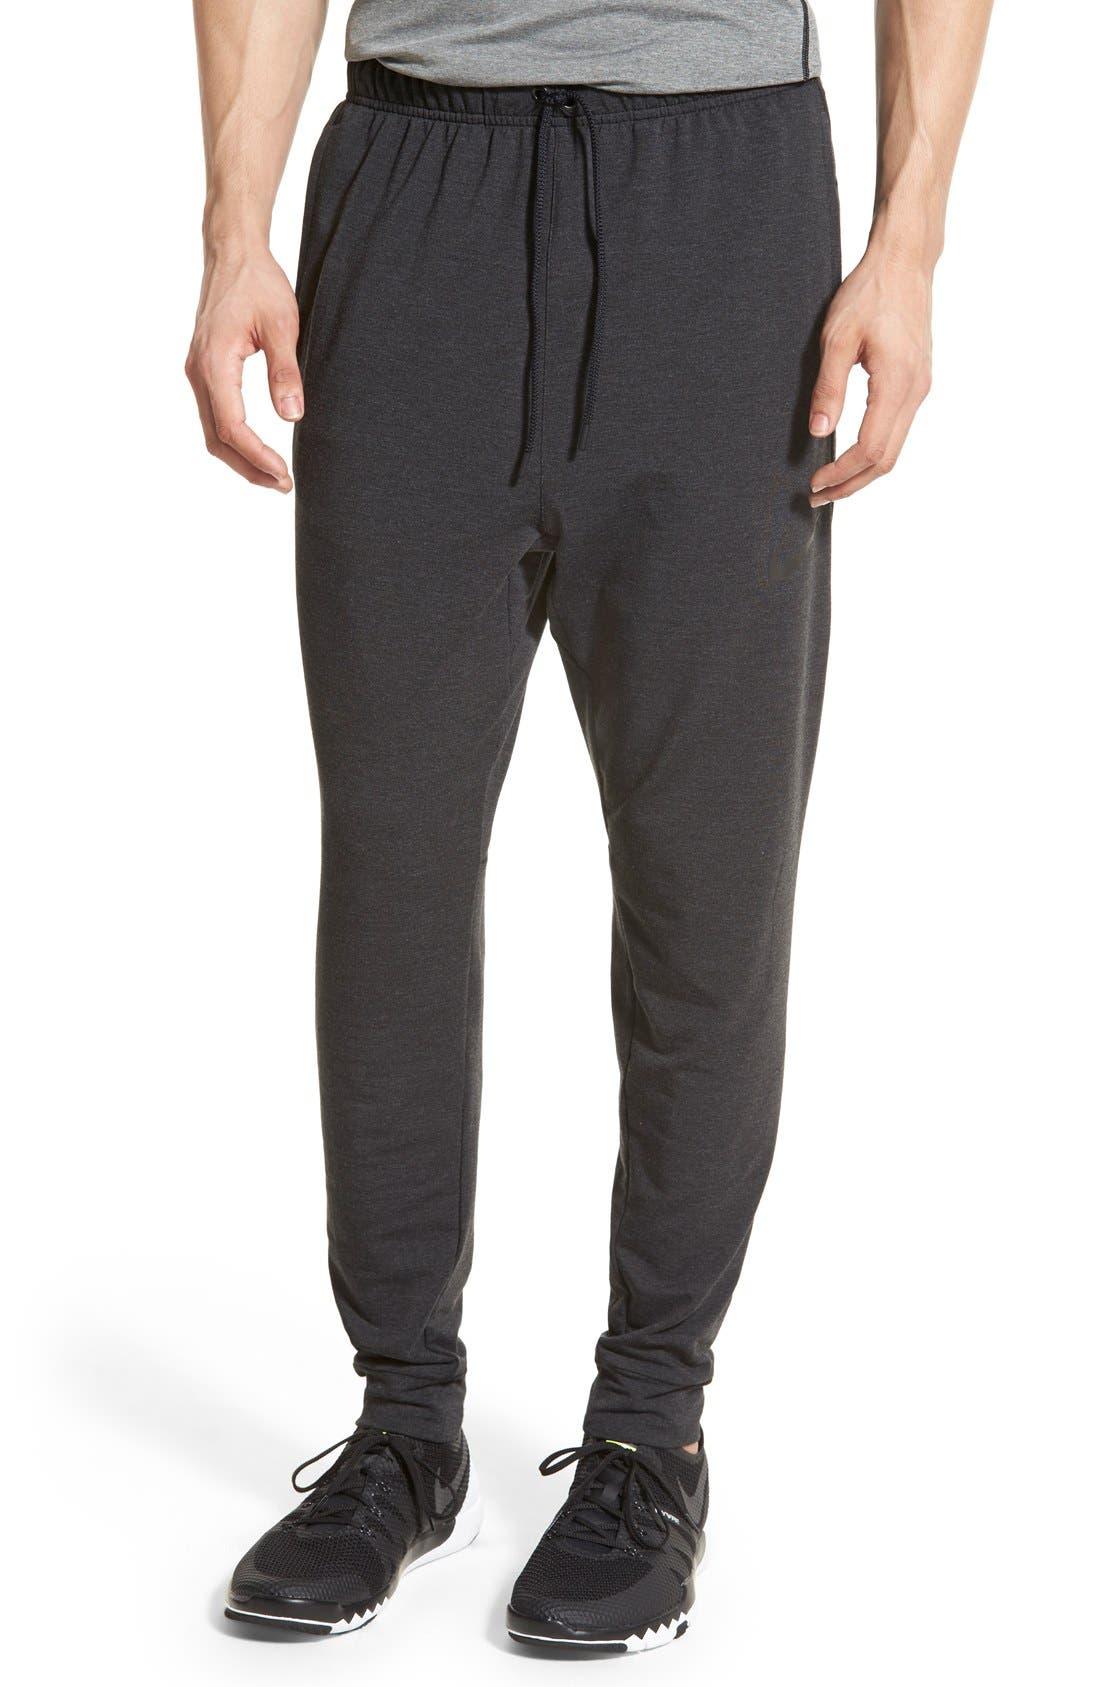 Dri-FIT Fleece Training Pants,                         Main,                         color, Black/ Black